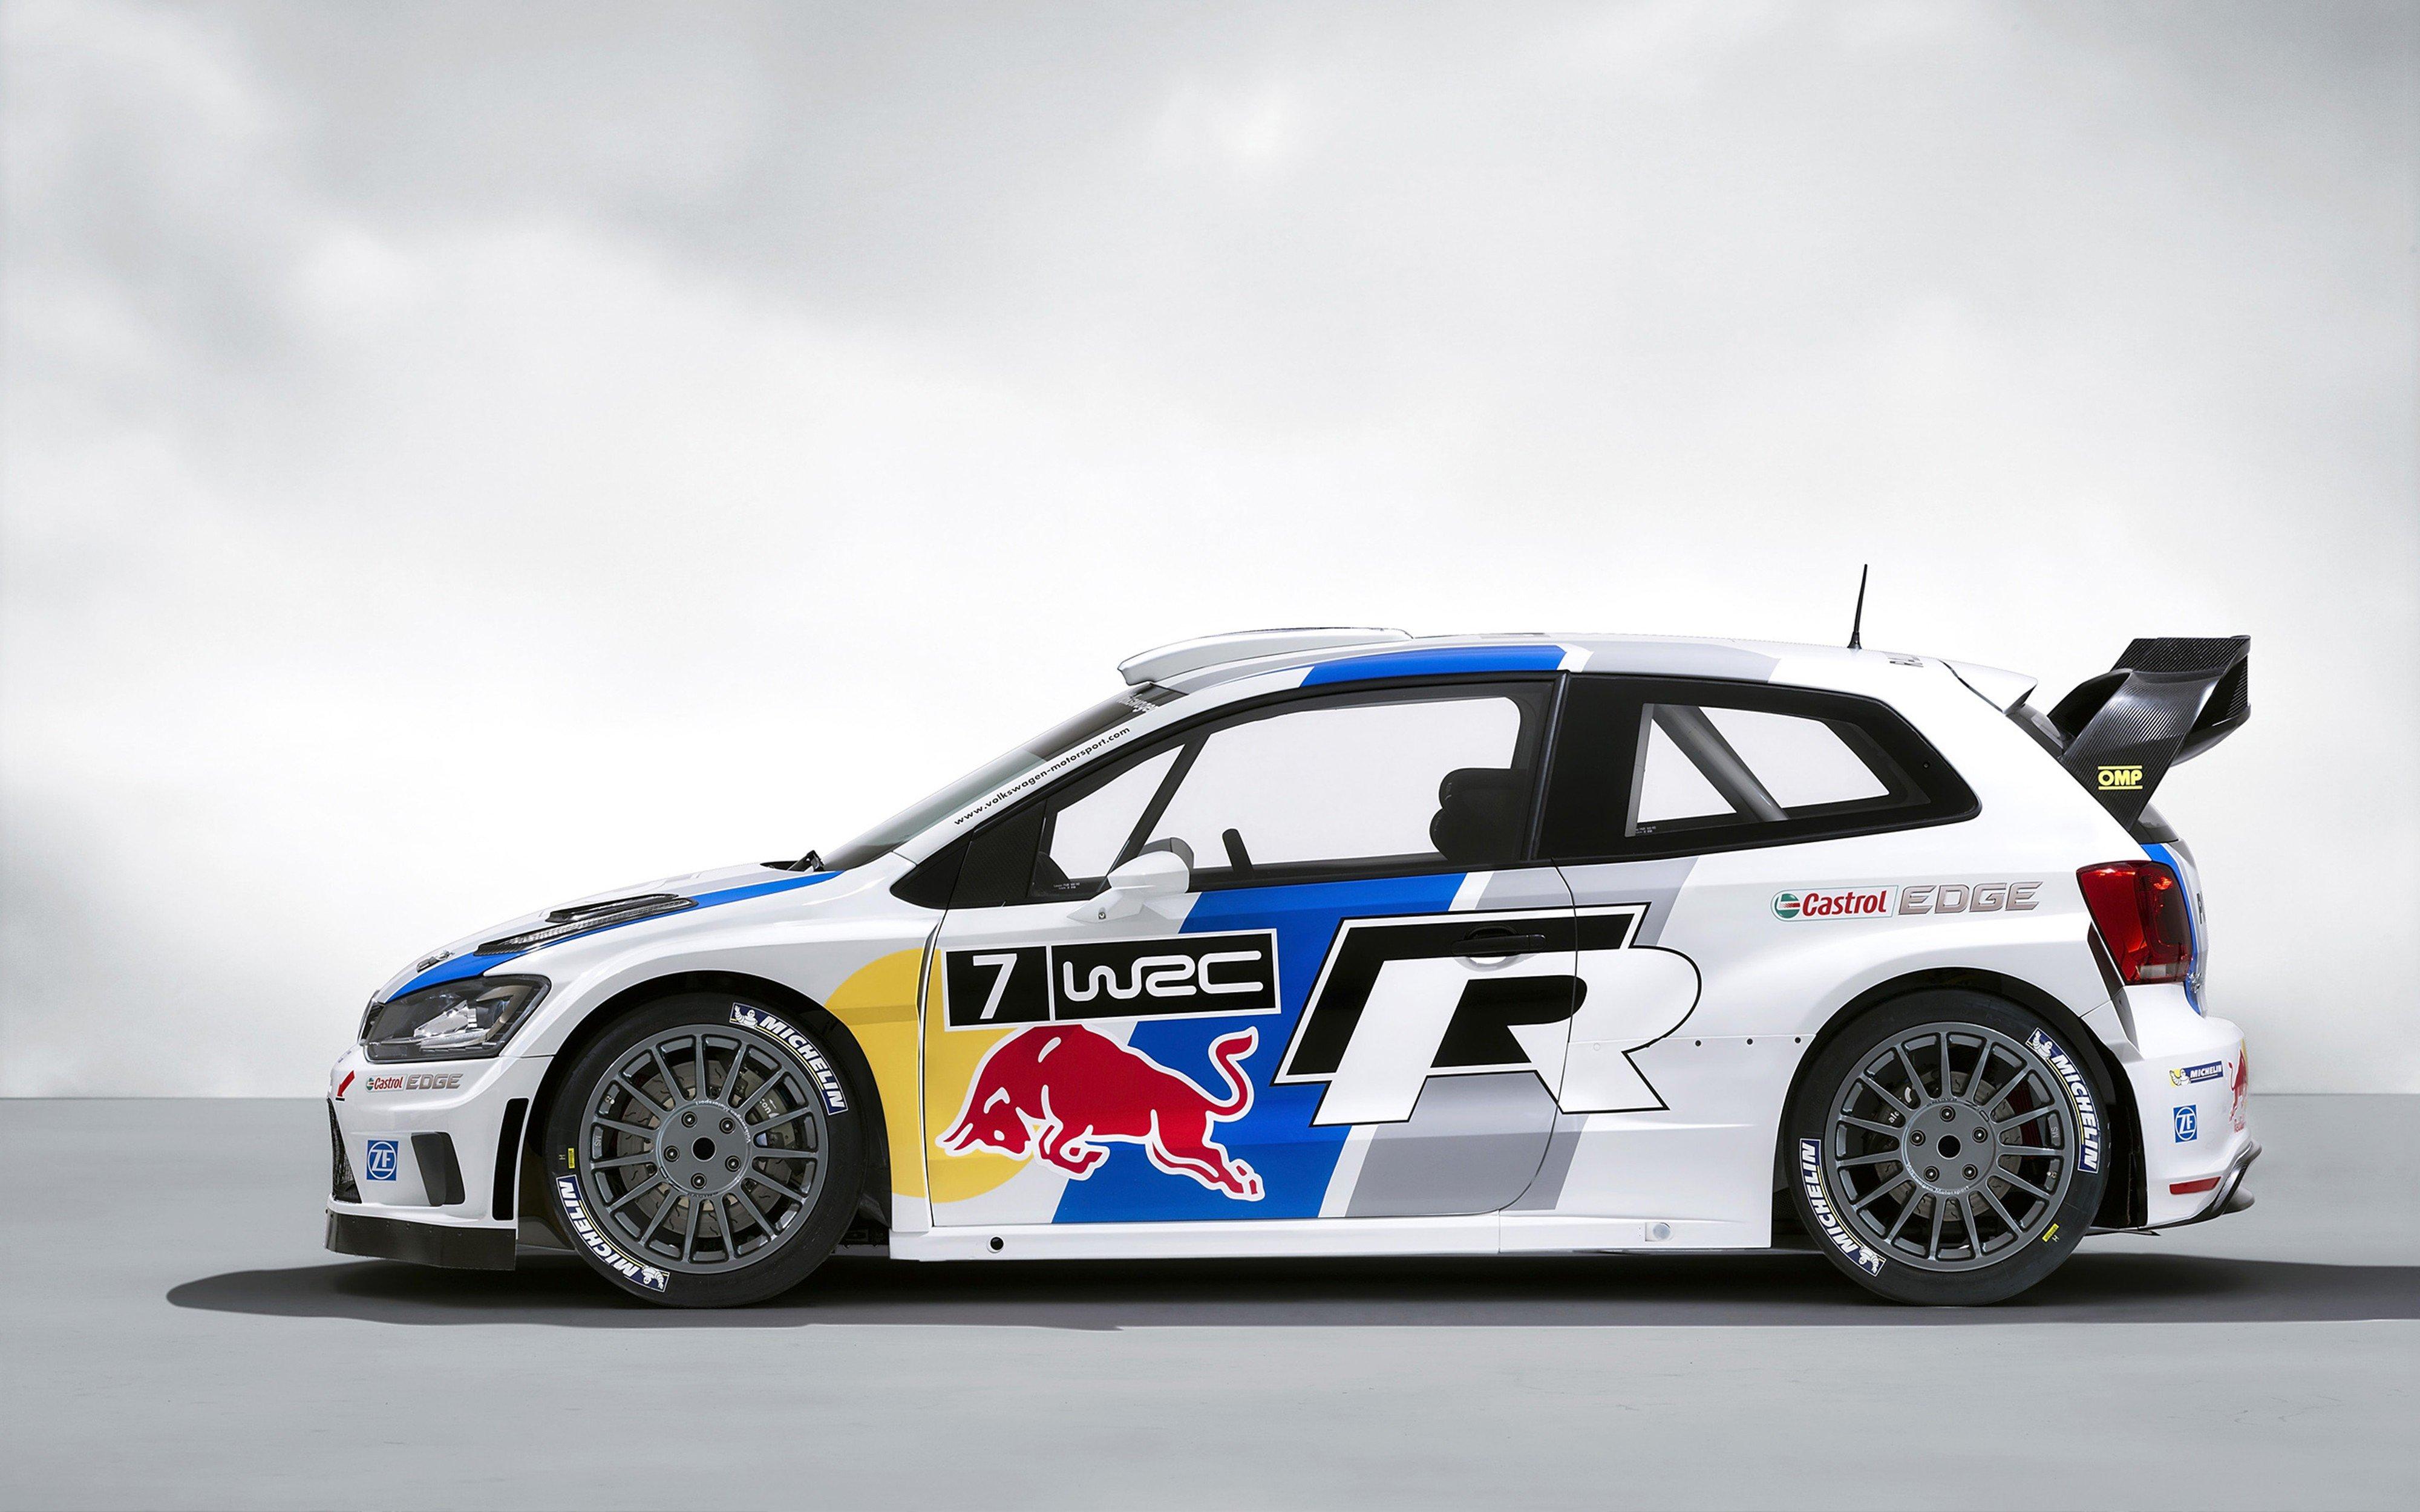 2017 Volkswagen Polo R Wrc Racing Rally Car Race 4000x2500 Wallpaper 350133 Wallpaperup